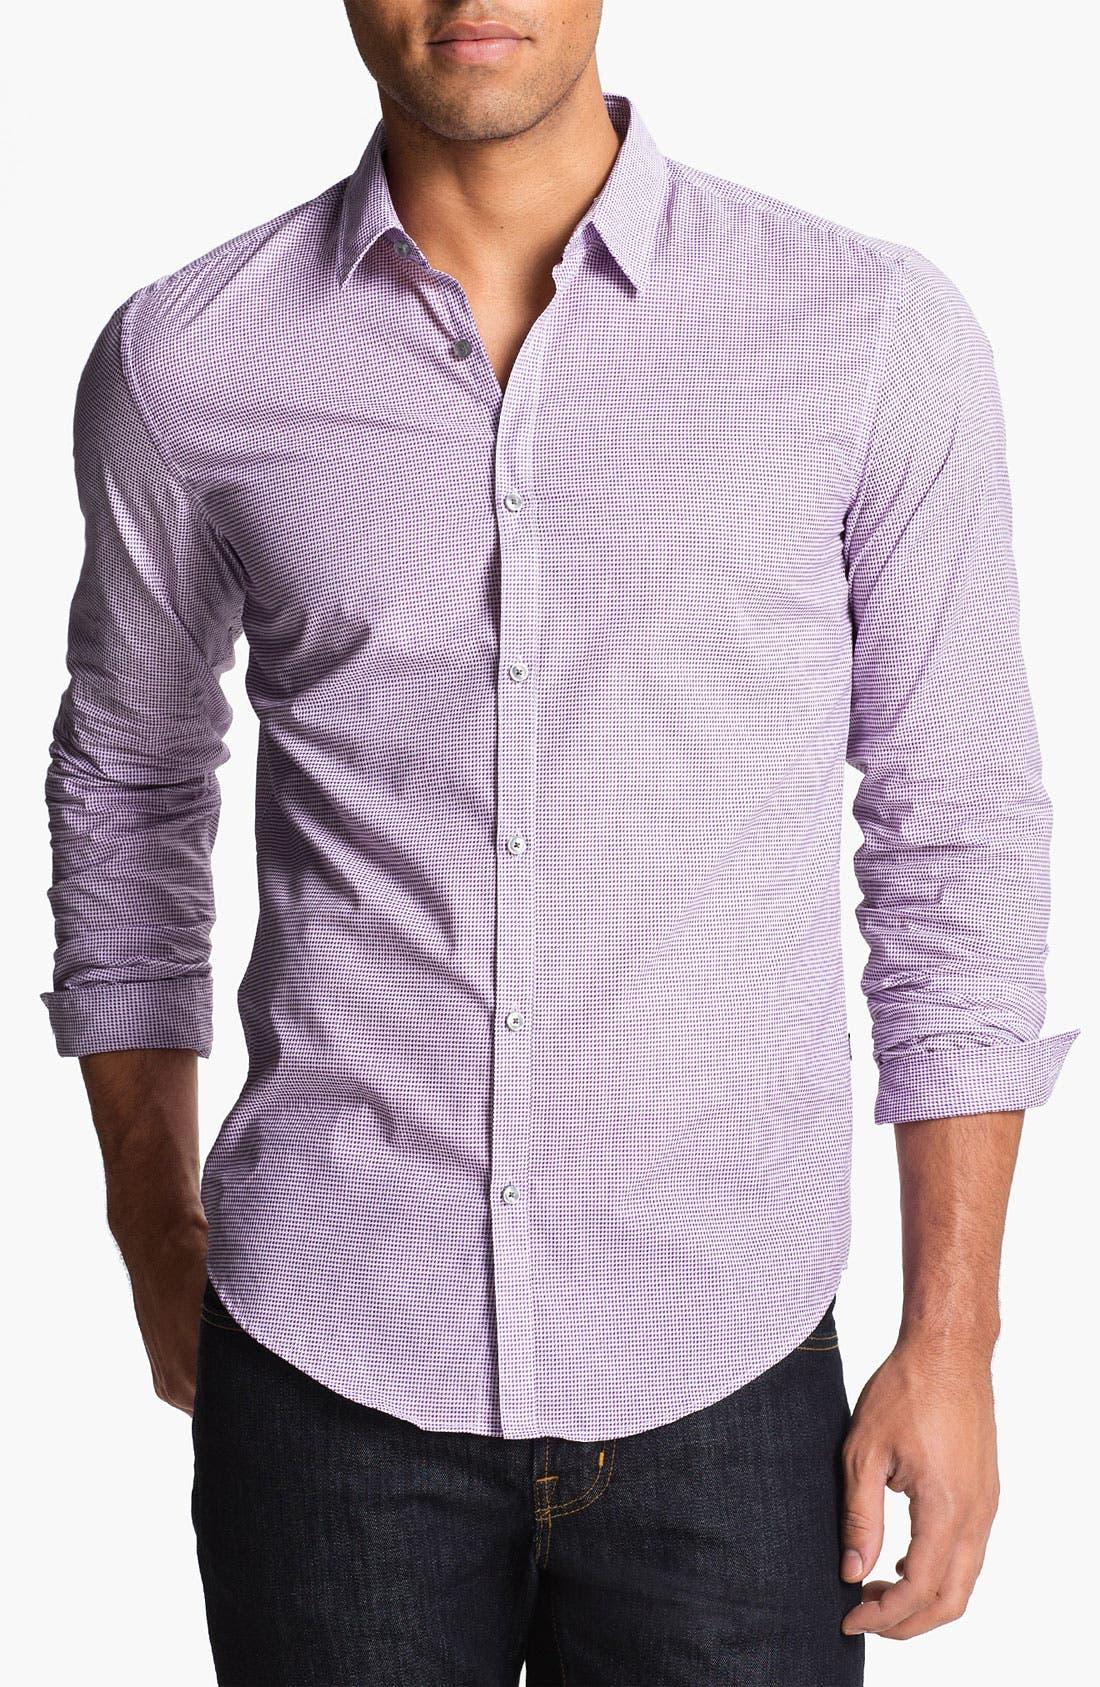 Alternate Image 1 Selected - BOSS HUGO BOSS 'Remus' Slim Fit Sport Shirt